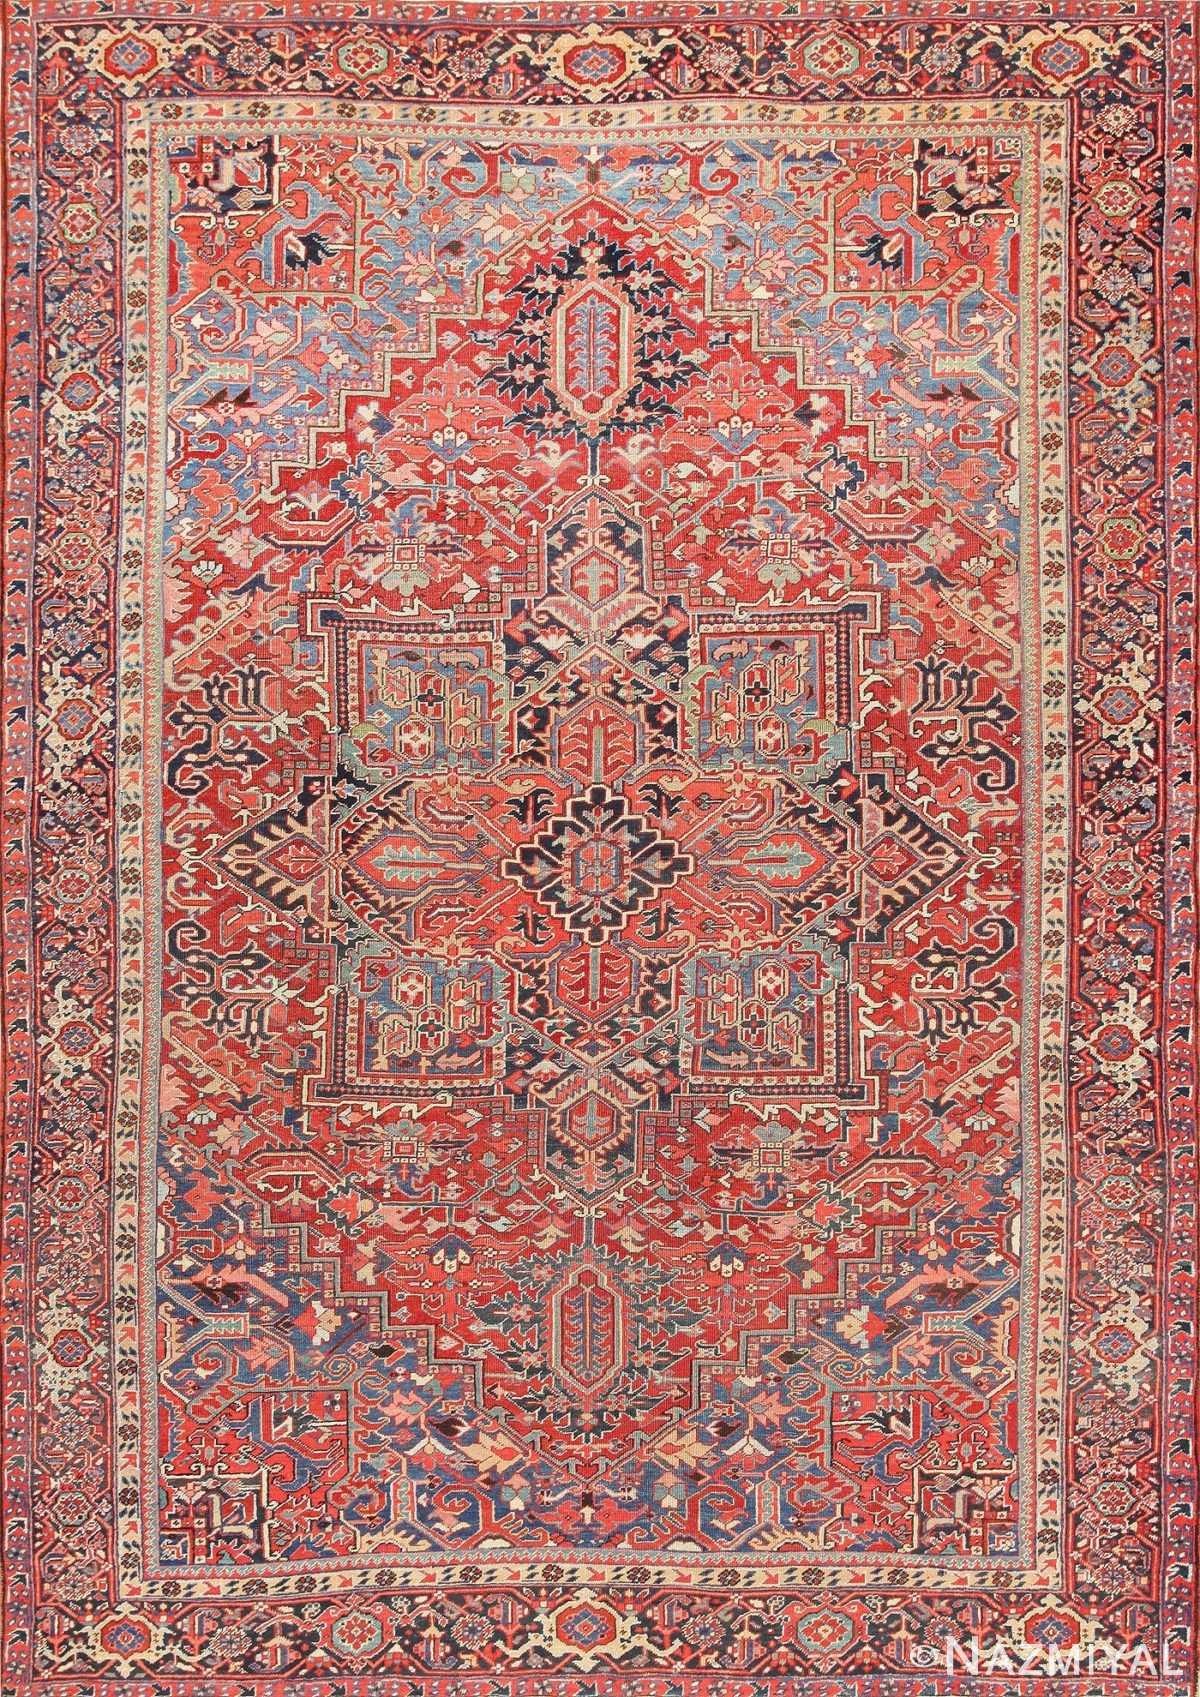 Antique Persian Heriz Carpet 47297 Detail/Large View